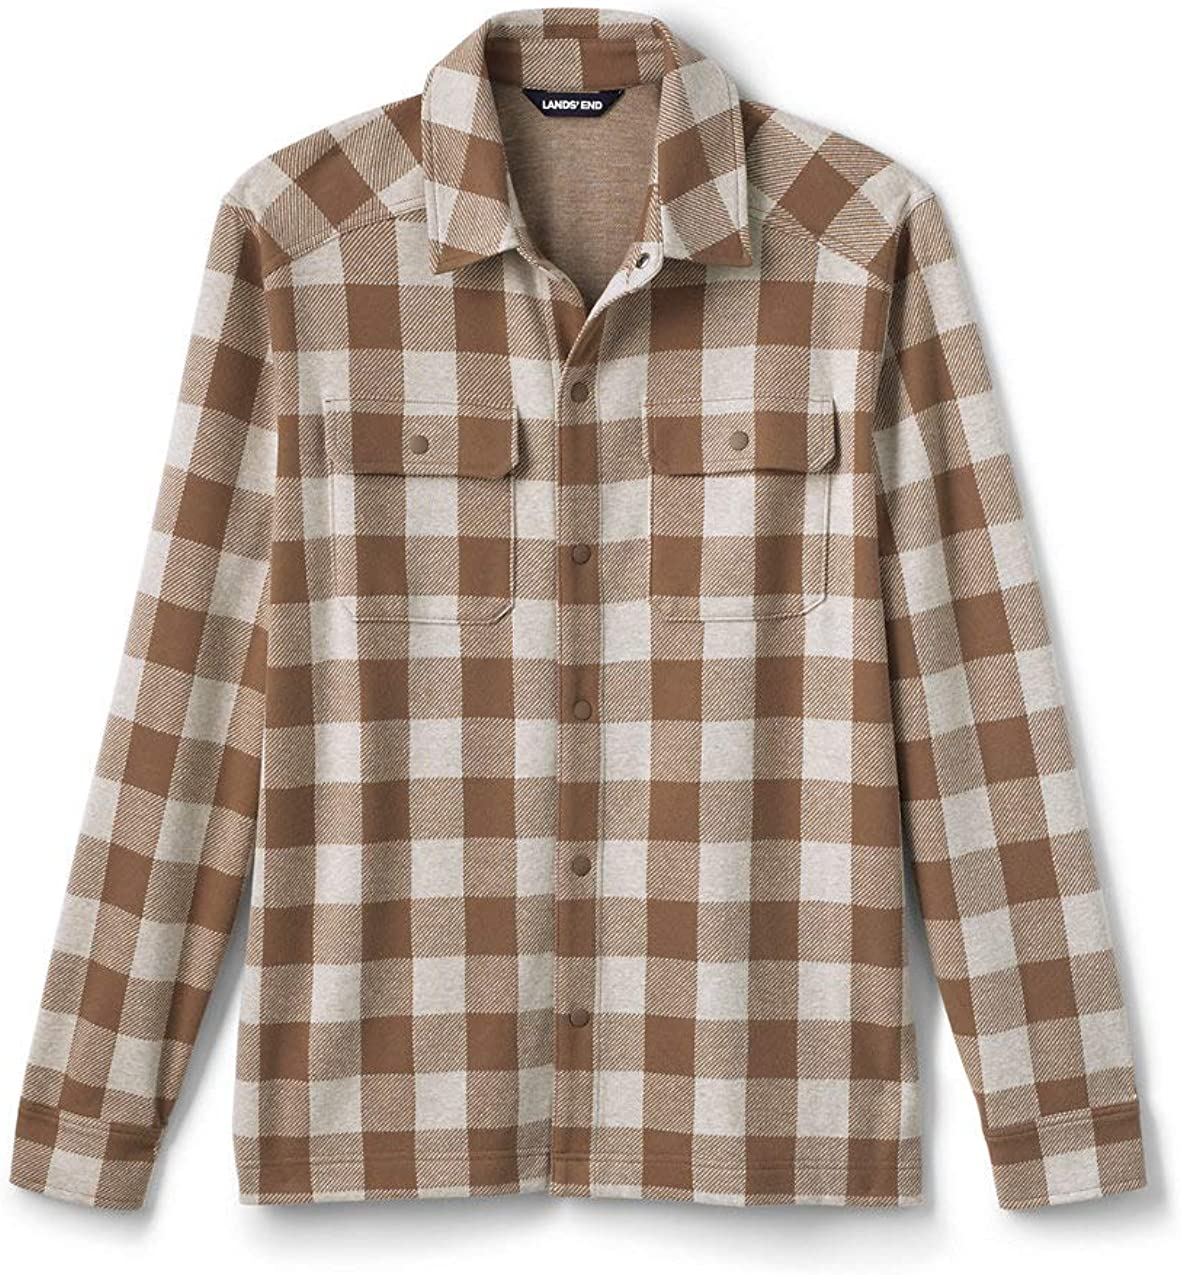 Lands' End Men's Long Sleeve Textured Cozy Shirt Jacket